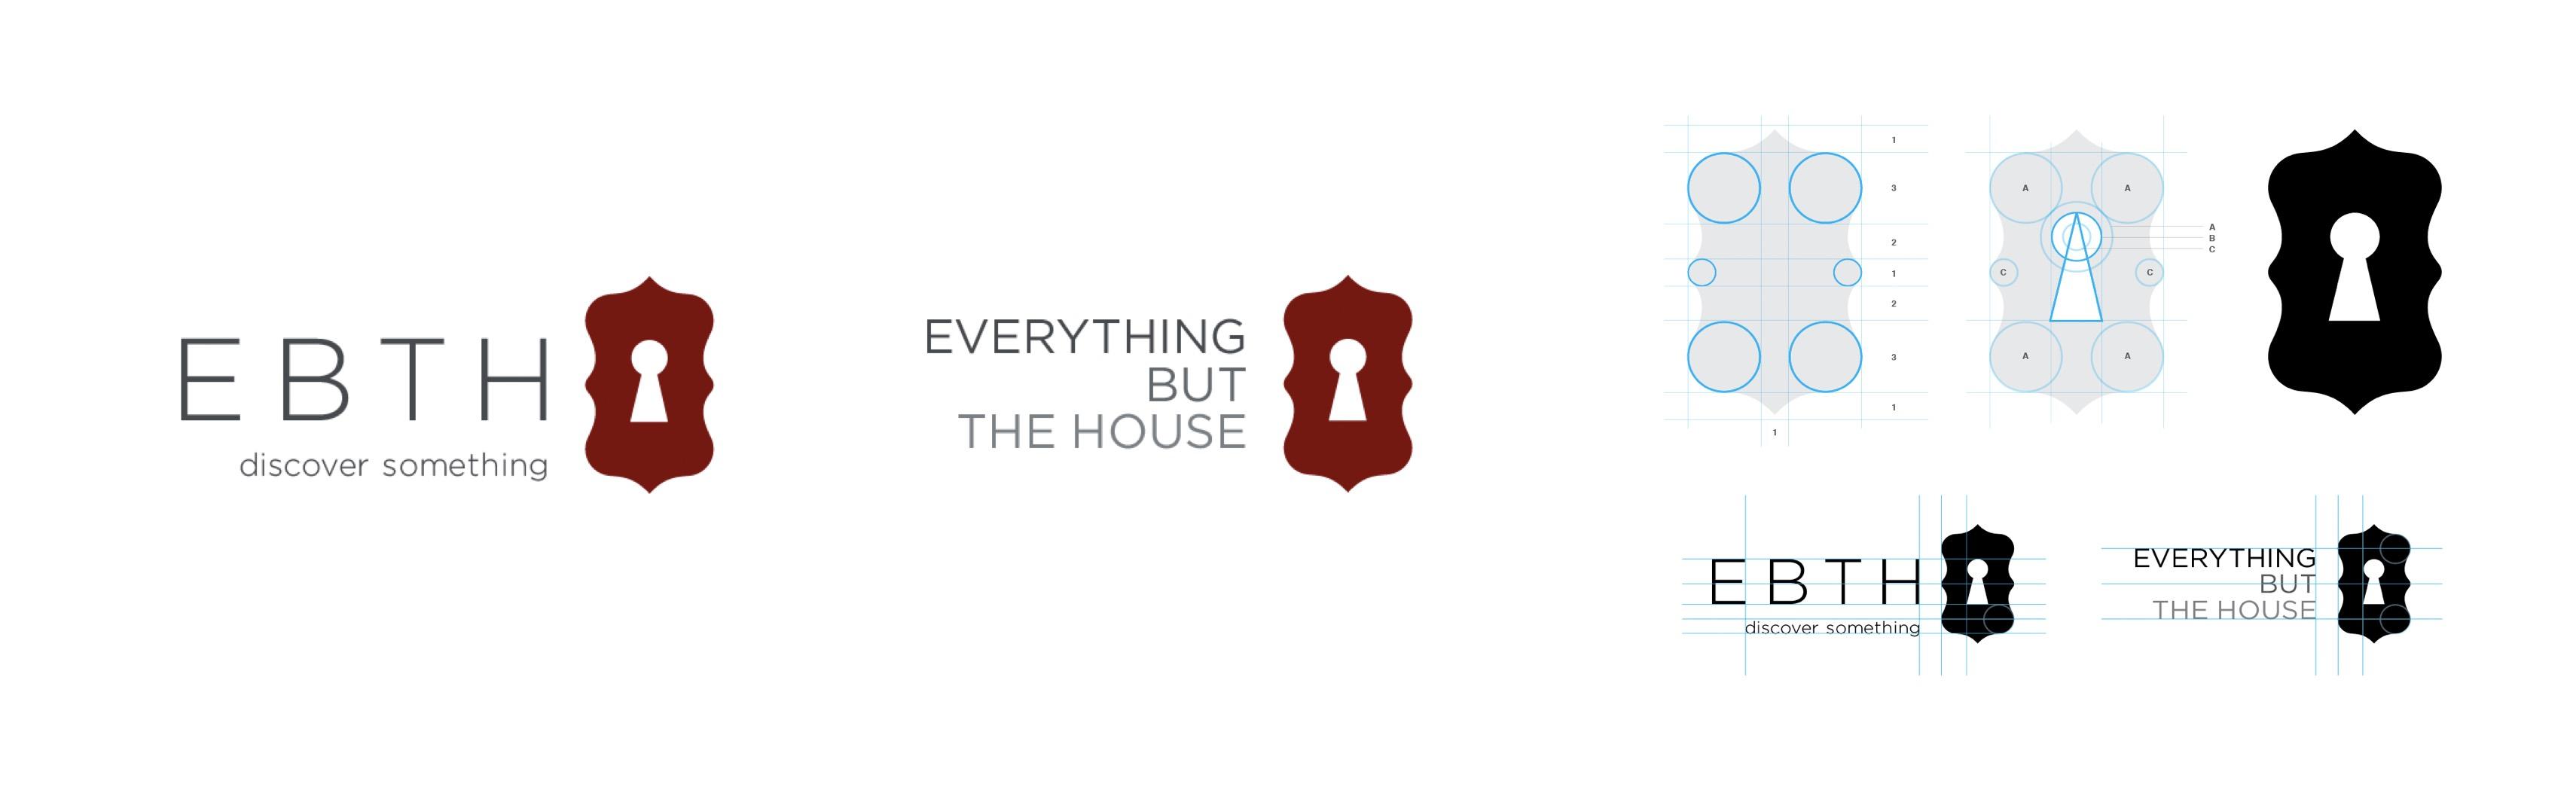 EBTH - Branding - Final logo